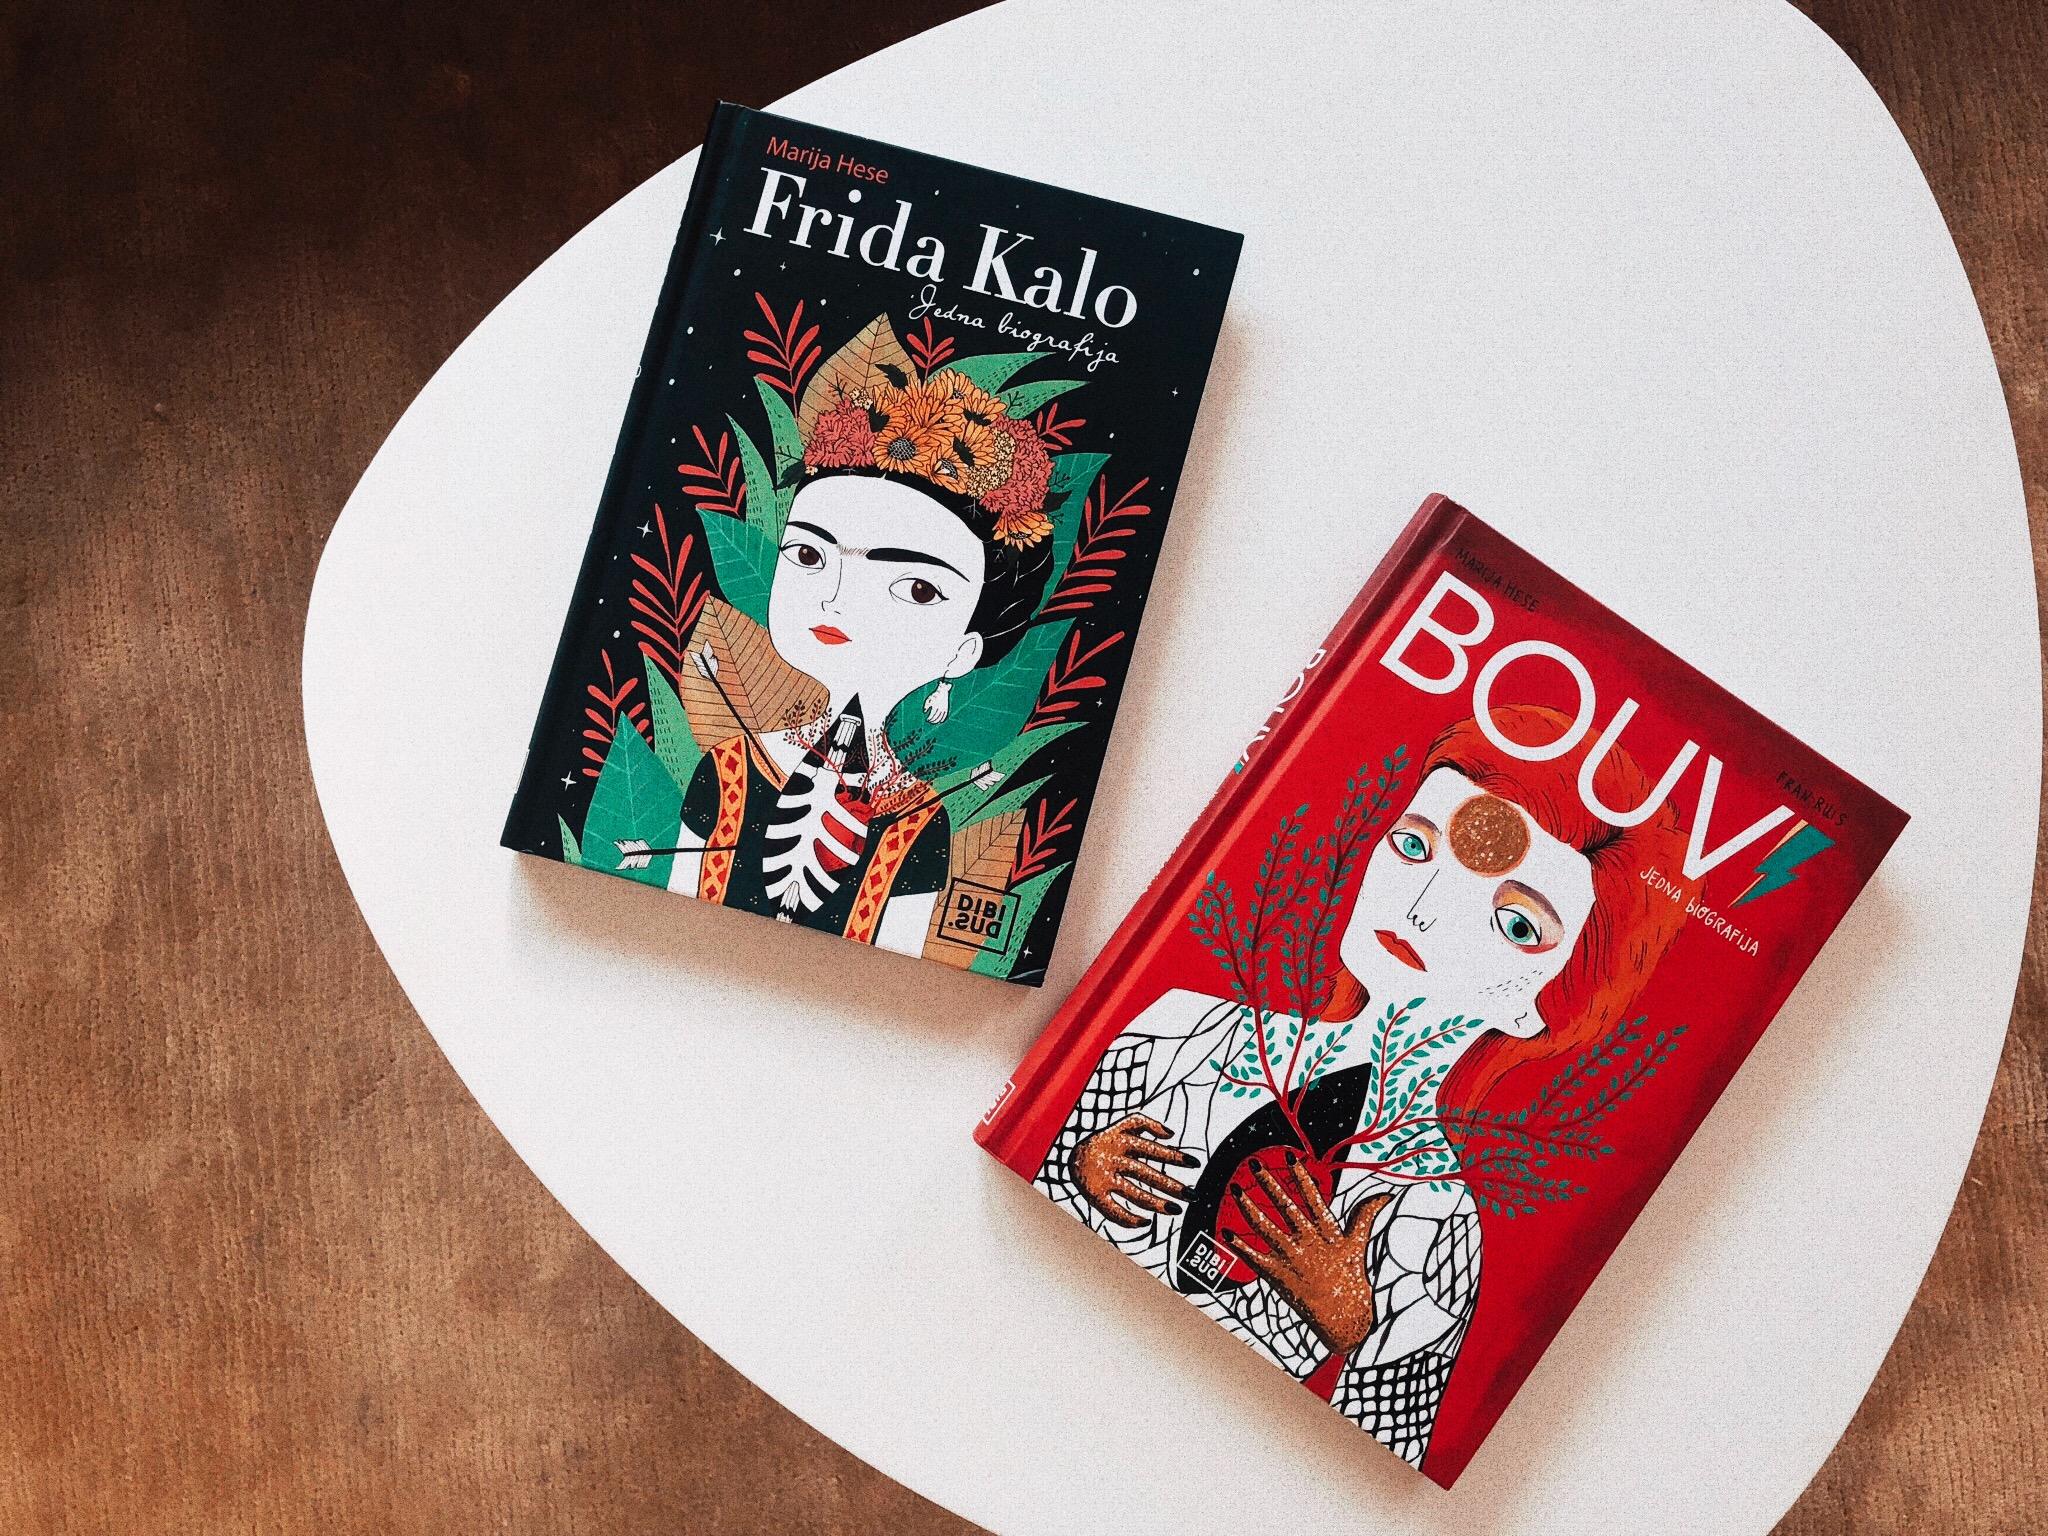 biografije david bowie i frida kahlo